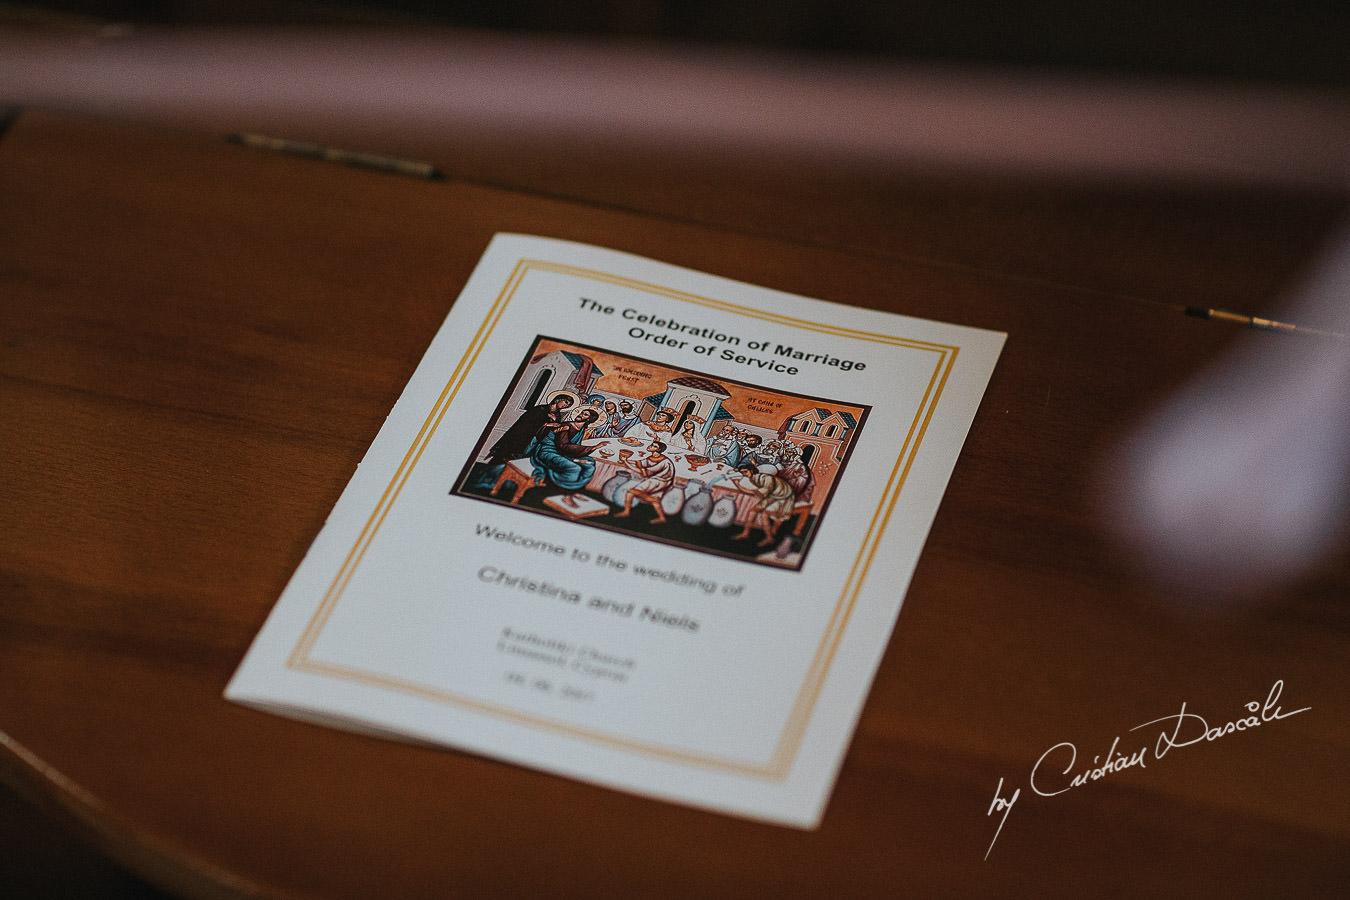 Wedding details captured at Catholiki Chuch in Limassol, Cyprus.